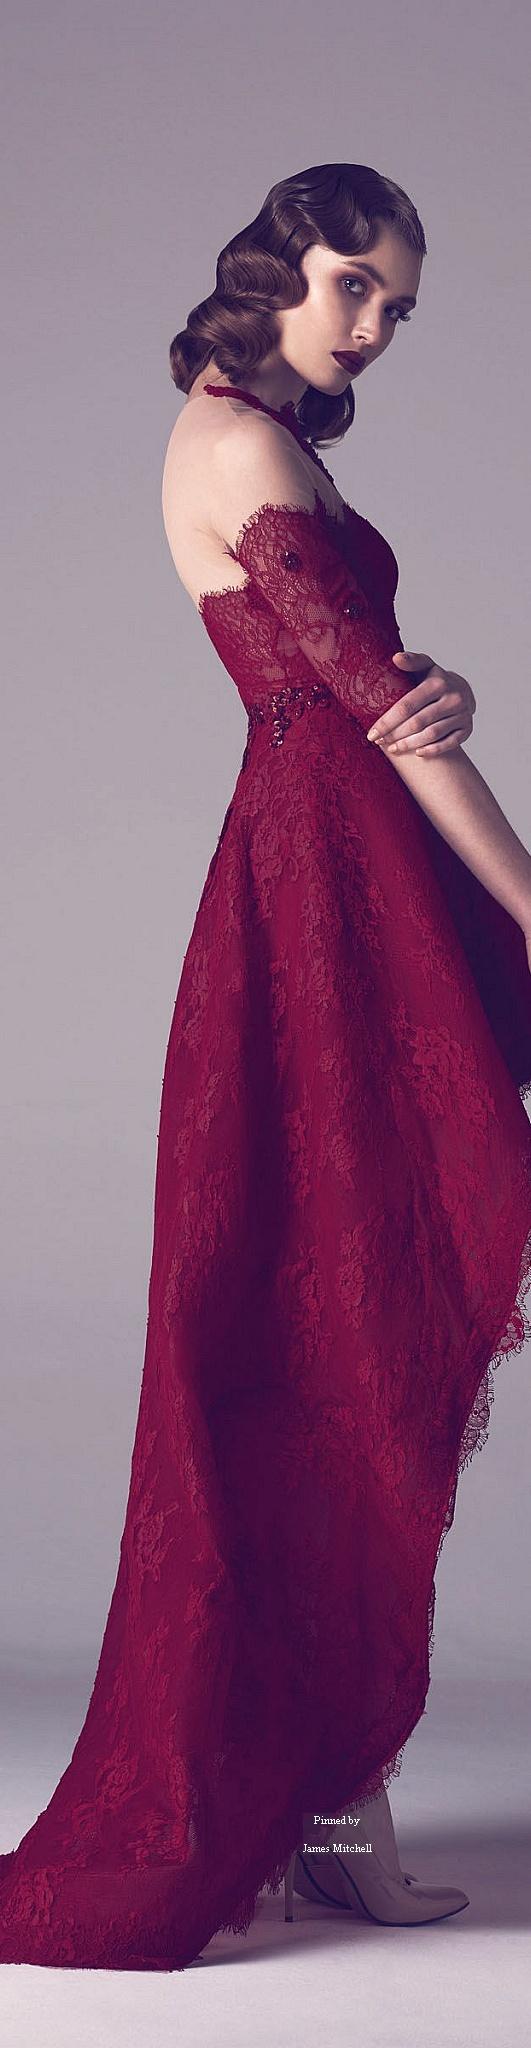 Fadwa baalbaki couture springsummer short dresses